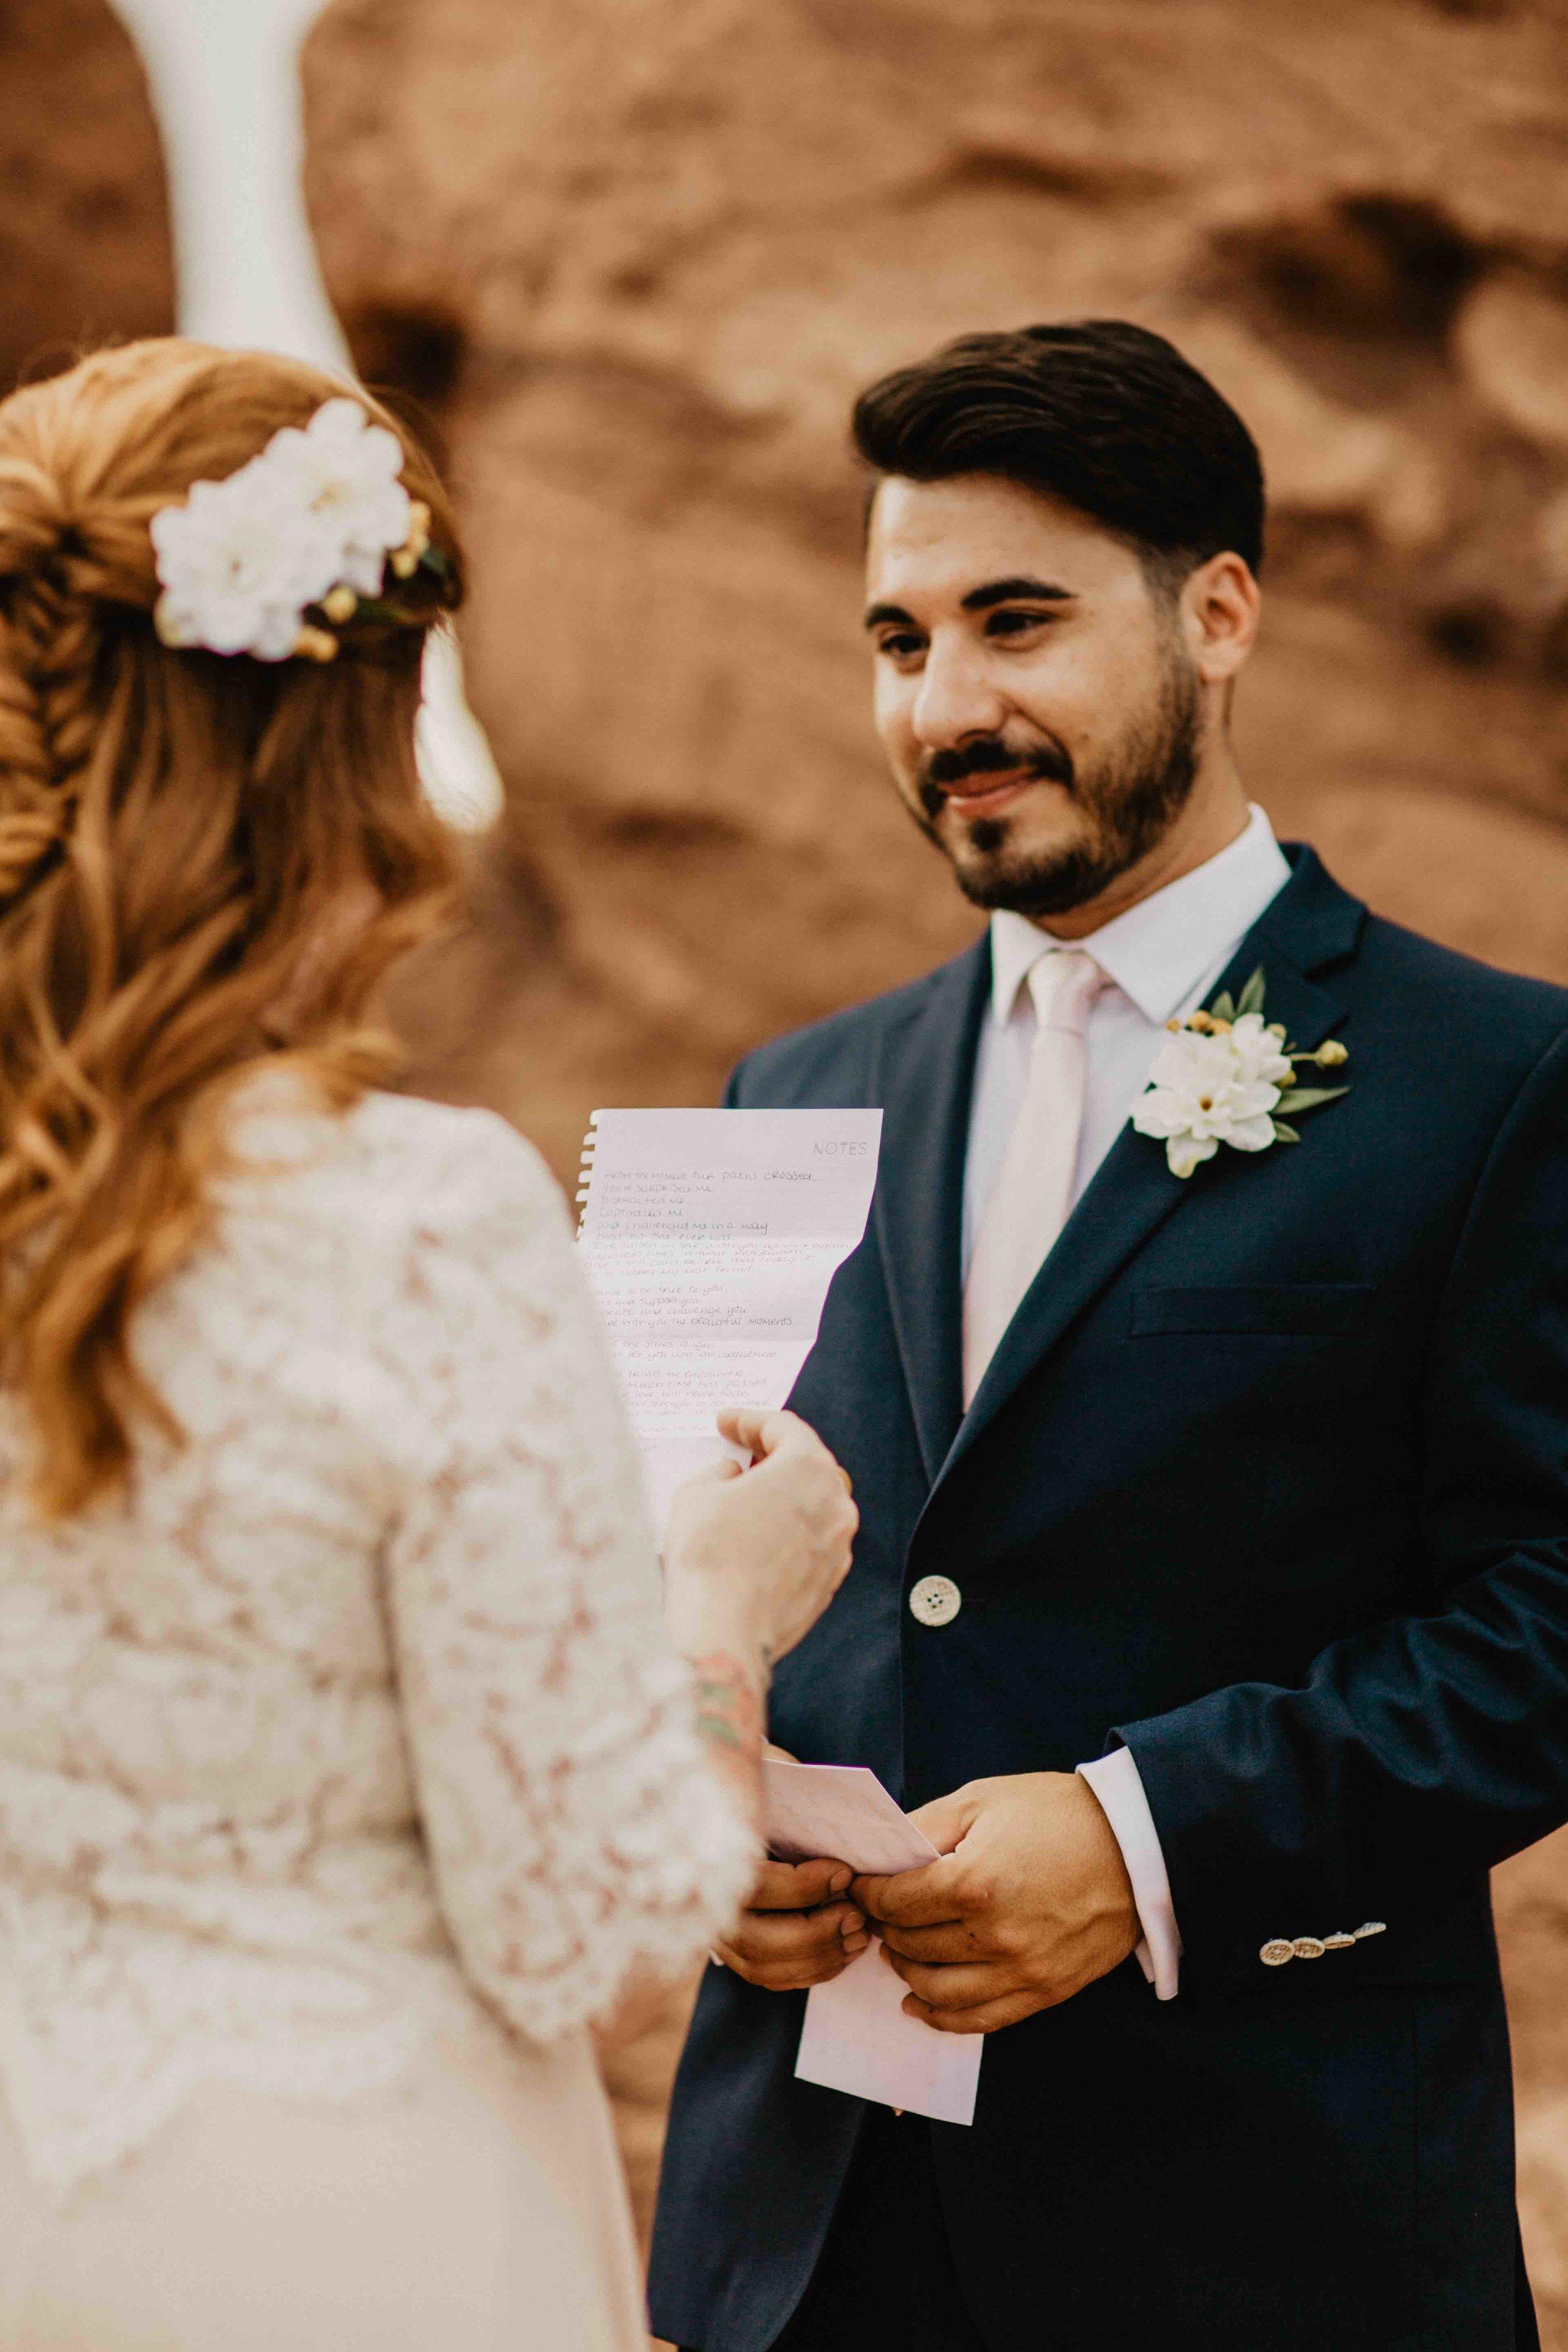 -colorado-wedding-photographer-denver-springs-vail-607A3852.jpeg